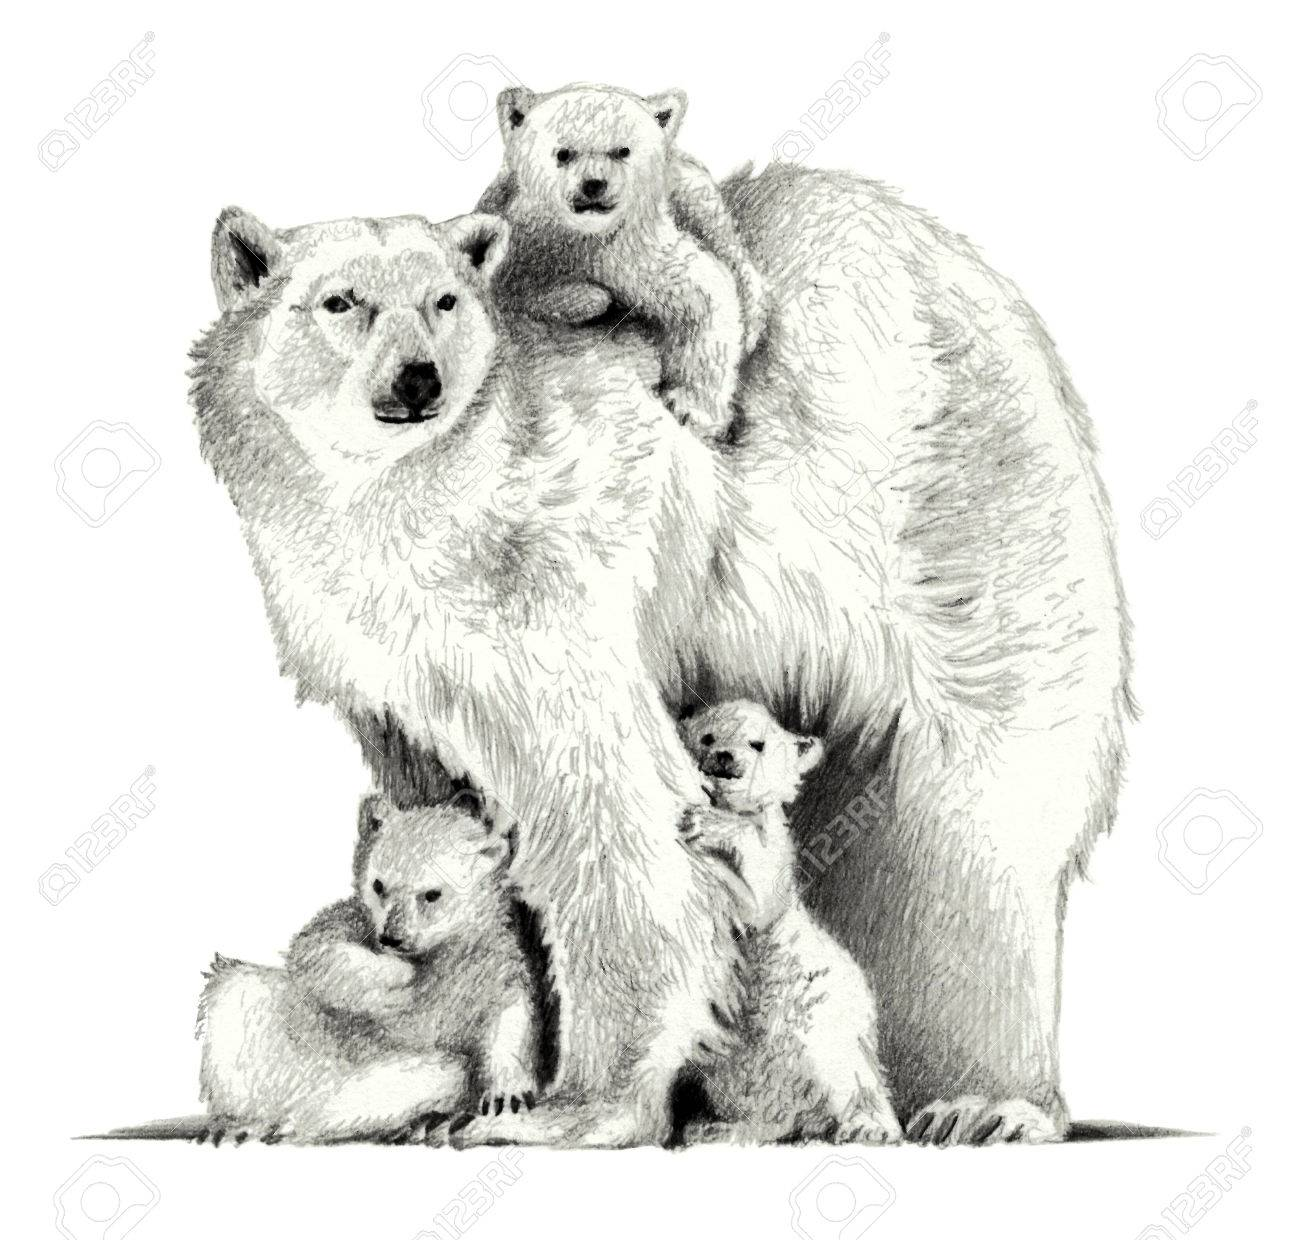 Polar bear with three cubs pencil sketch